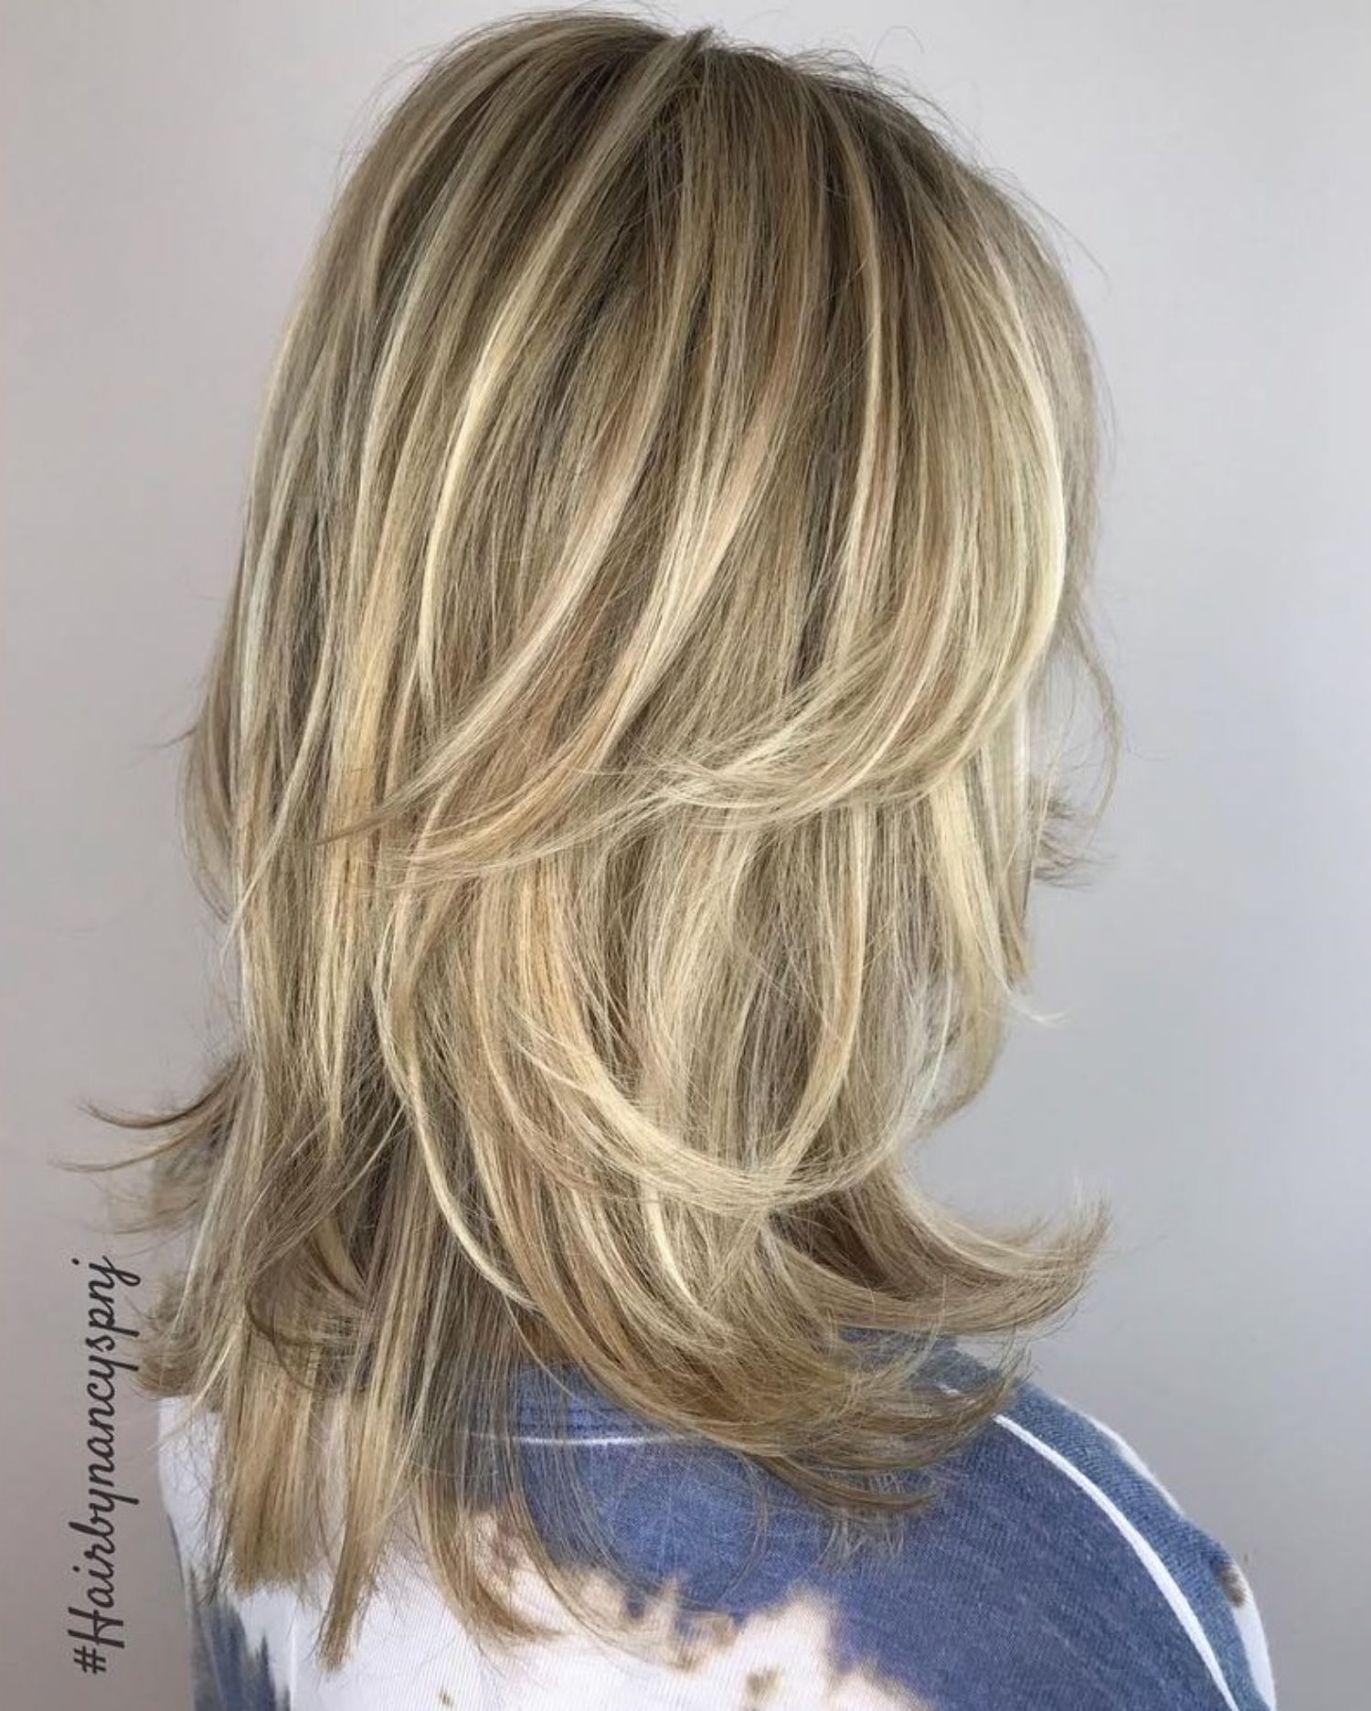 Medium Shag Haircut With Blonde Balayage In 2020 Lang Haar Kapsels Kapsels Lange Kapsels